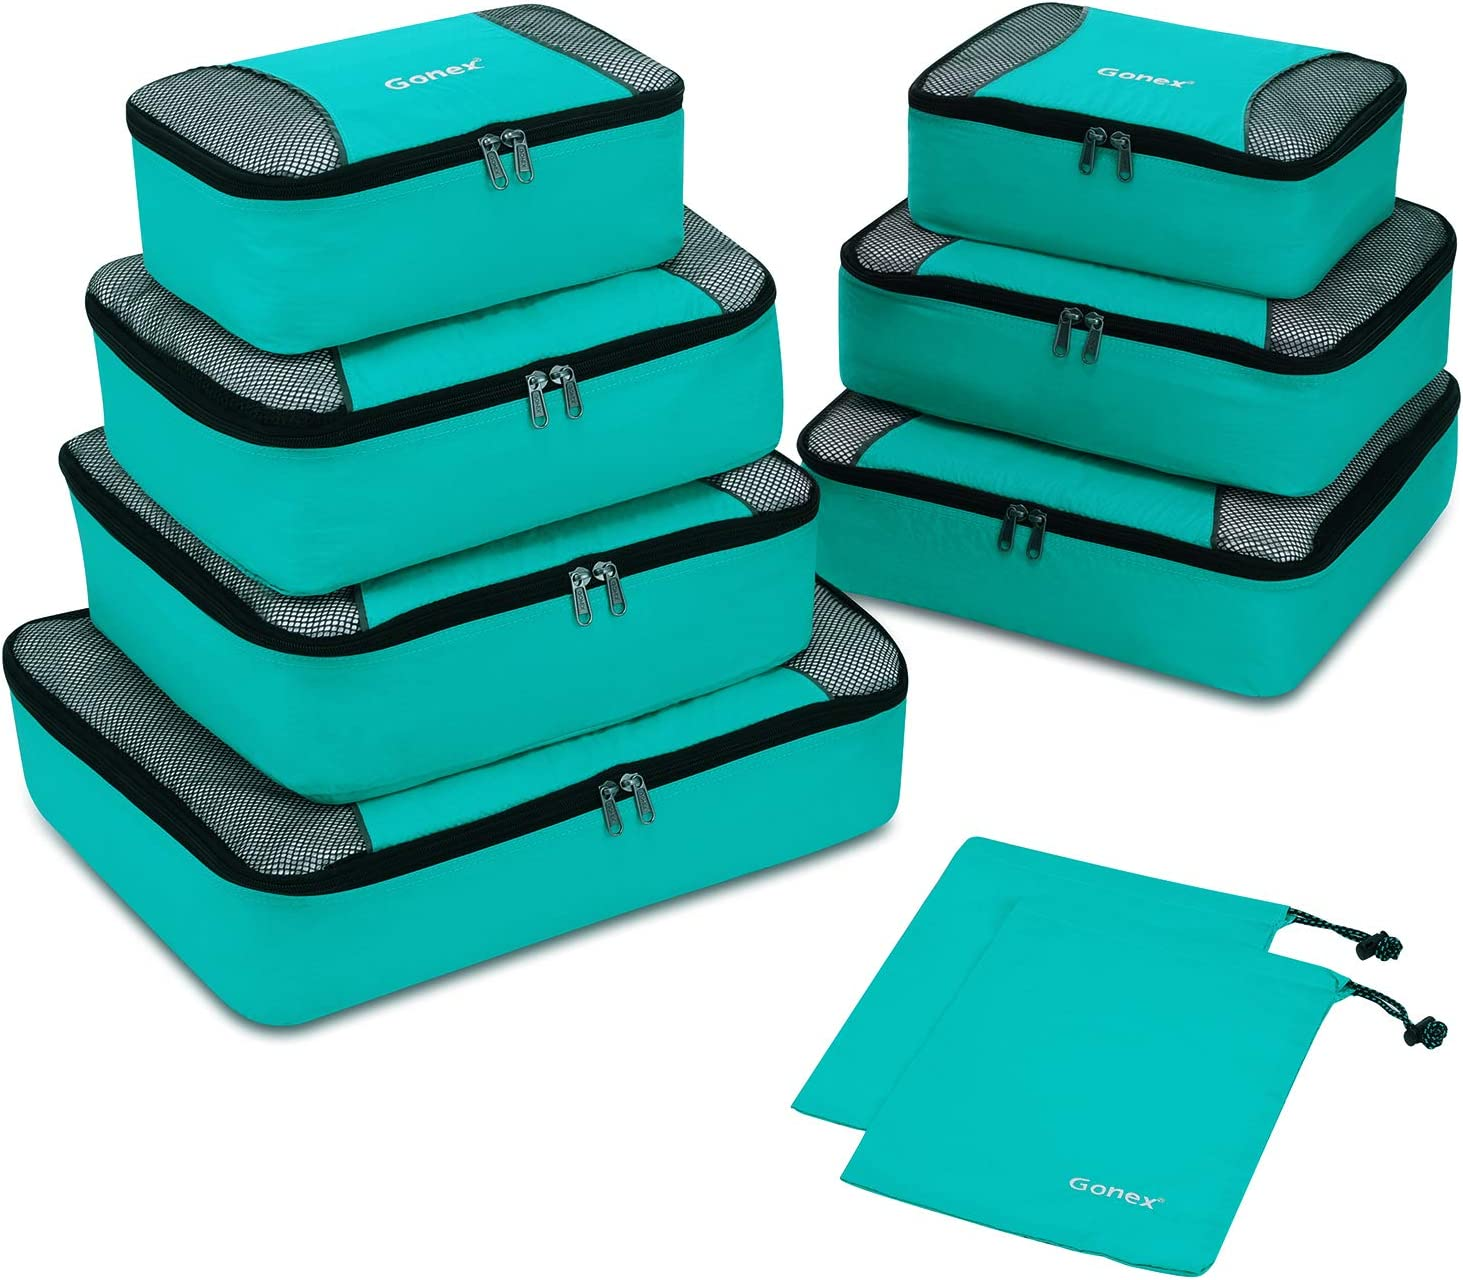 Organizador para Maleta Equipaje, Gonex Bolsas de Viajes Cubos de Embalaje Almacenaje Impermeable para Ropa Zapatos Cosméticos Accesorios Portátil Neceser de Viaje Tocador, Kit de 9 PCS (Azul Claro)